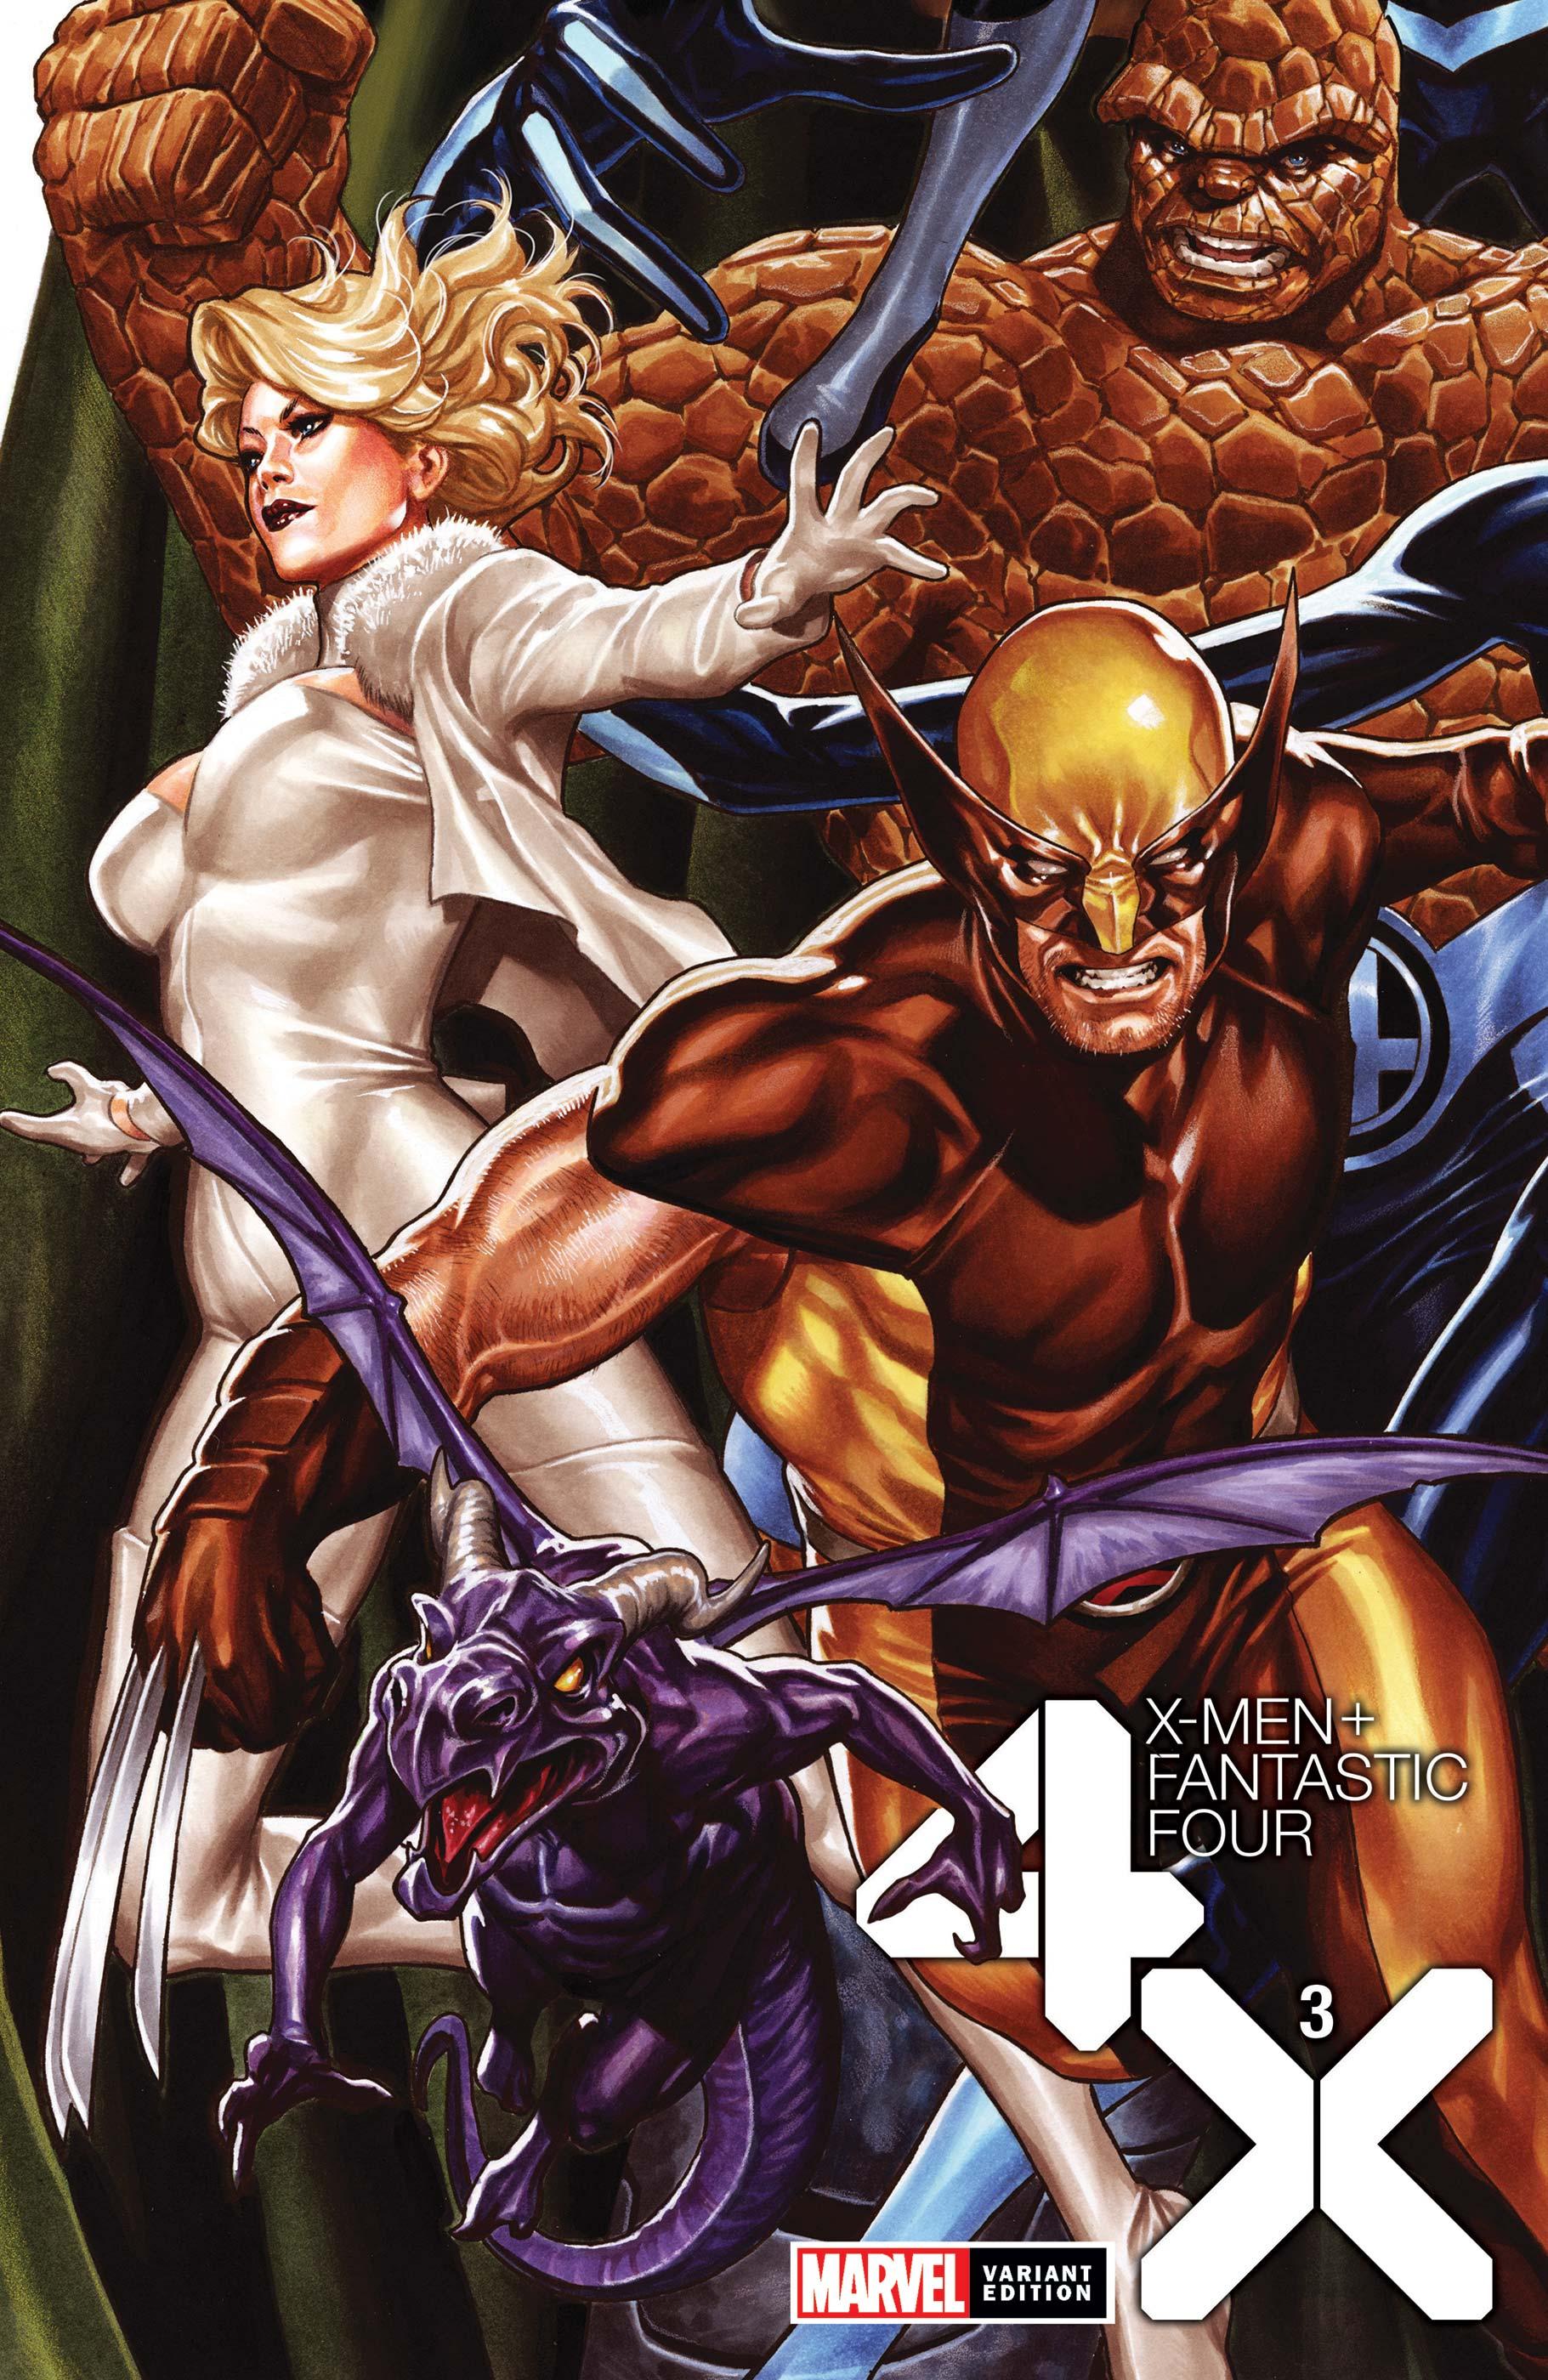 X-Men/Fantastic Four (2020) #3 (Variant)